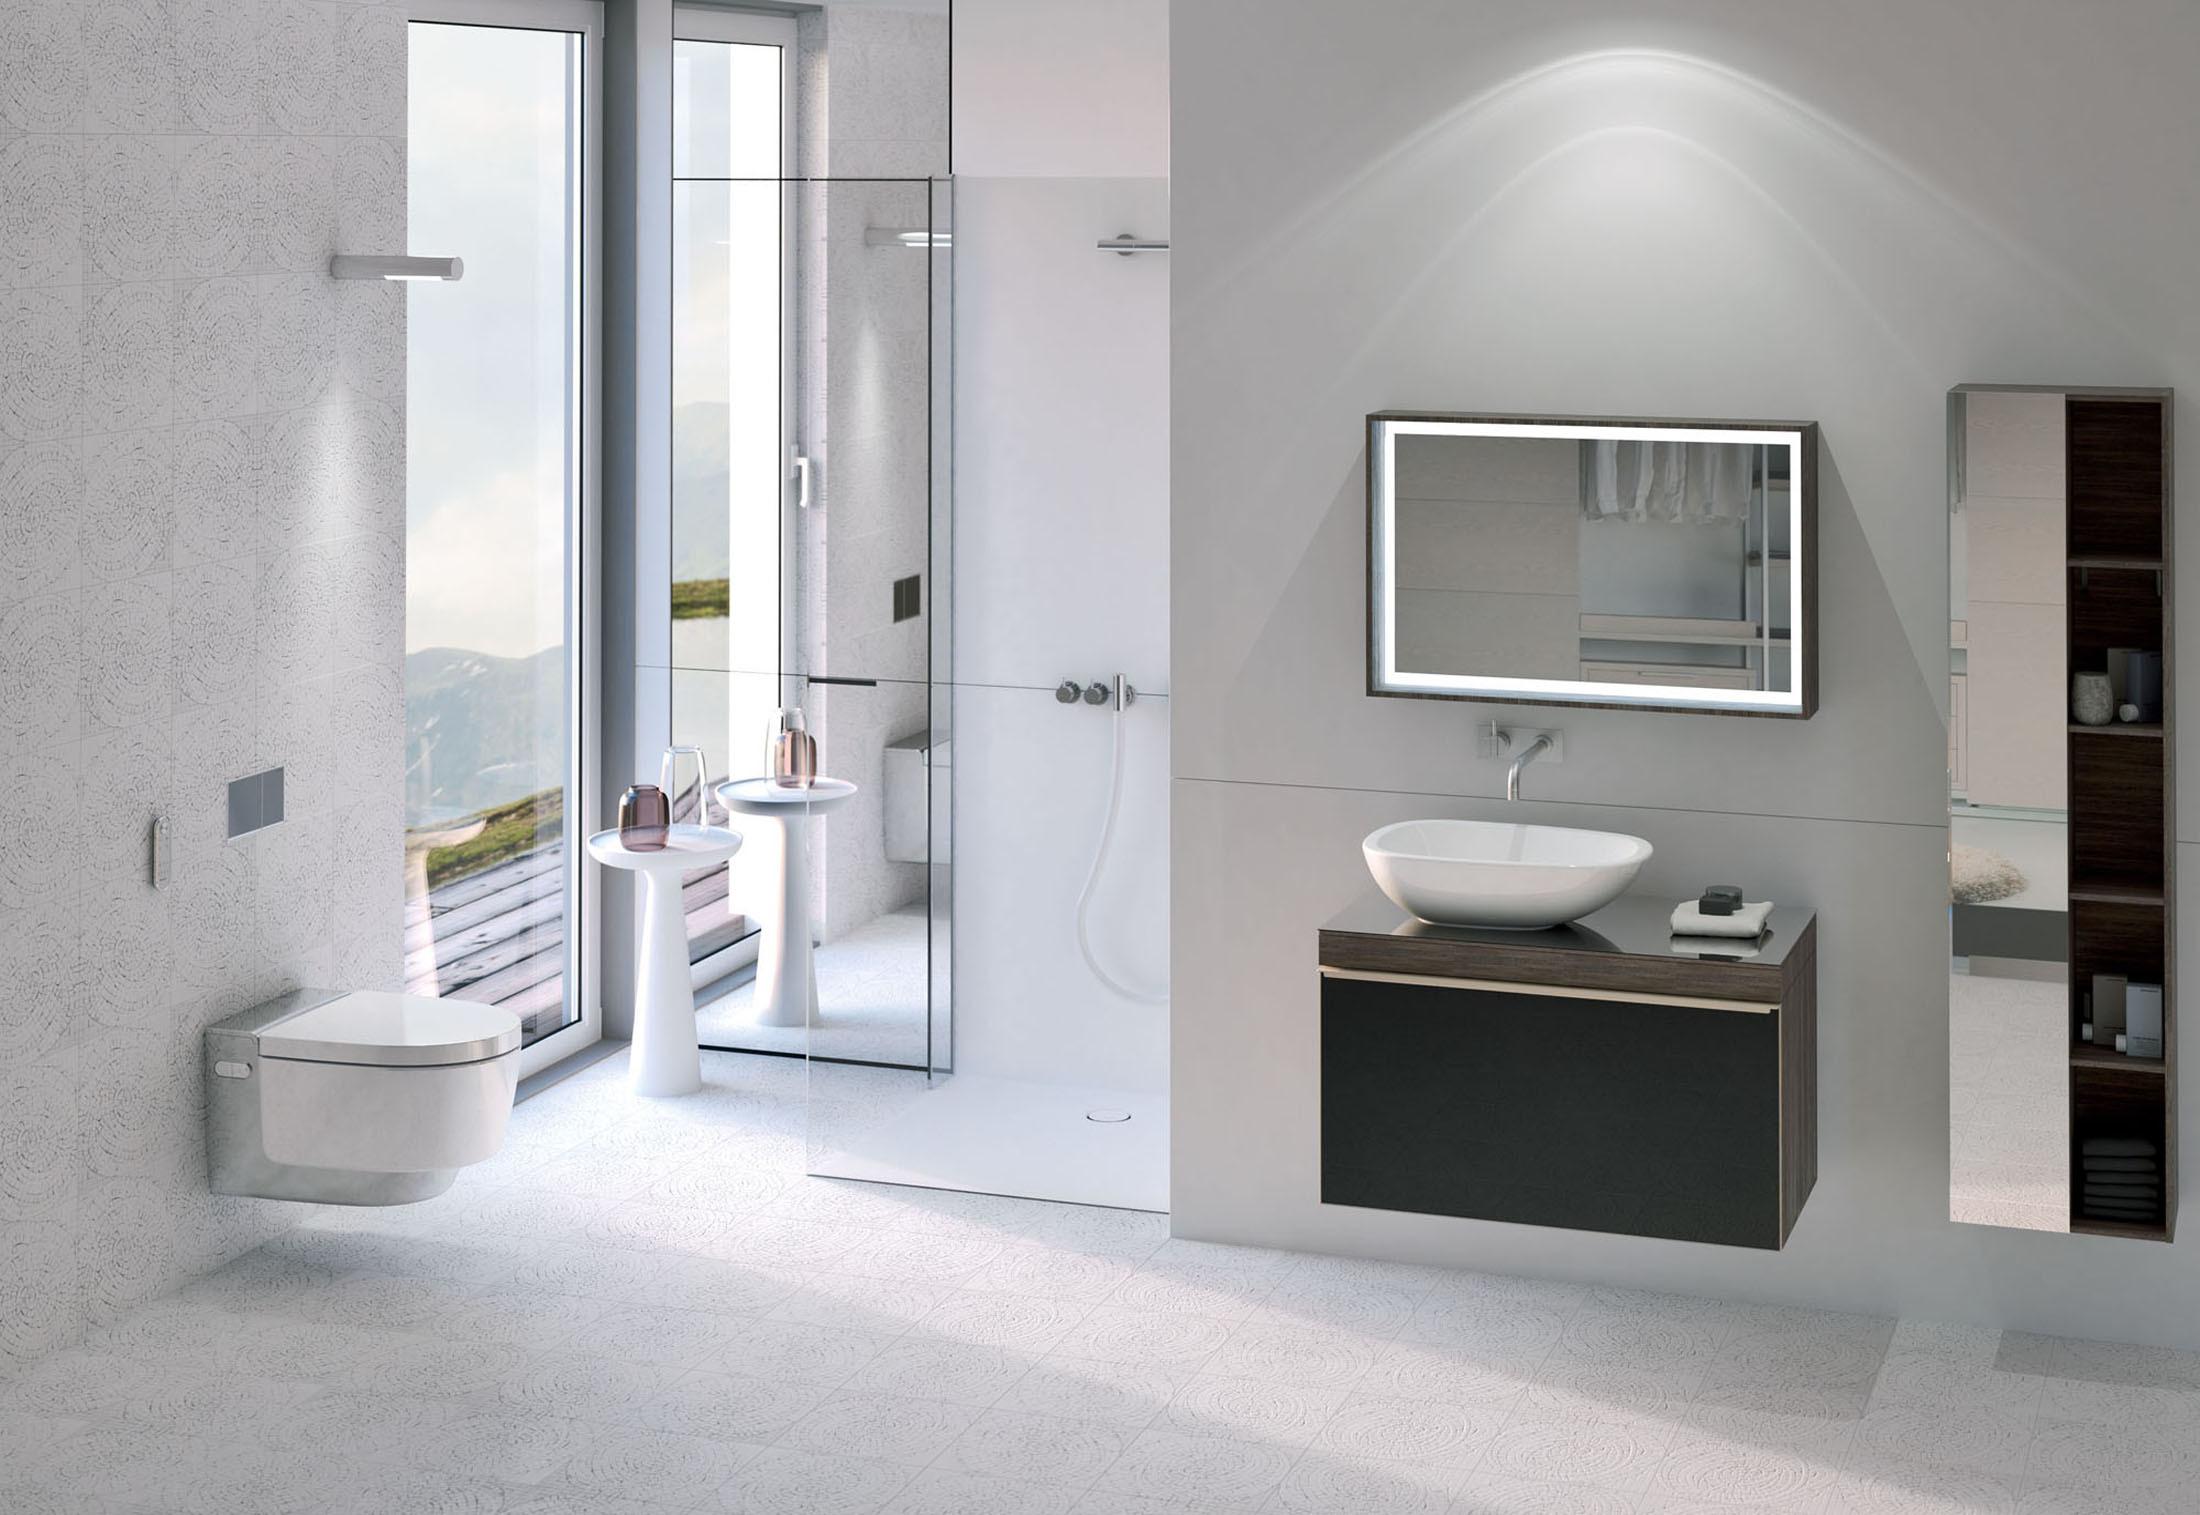 shower toilet aquaclean mera comfort by